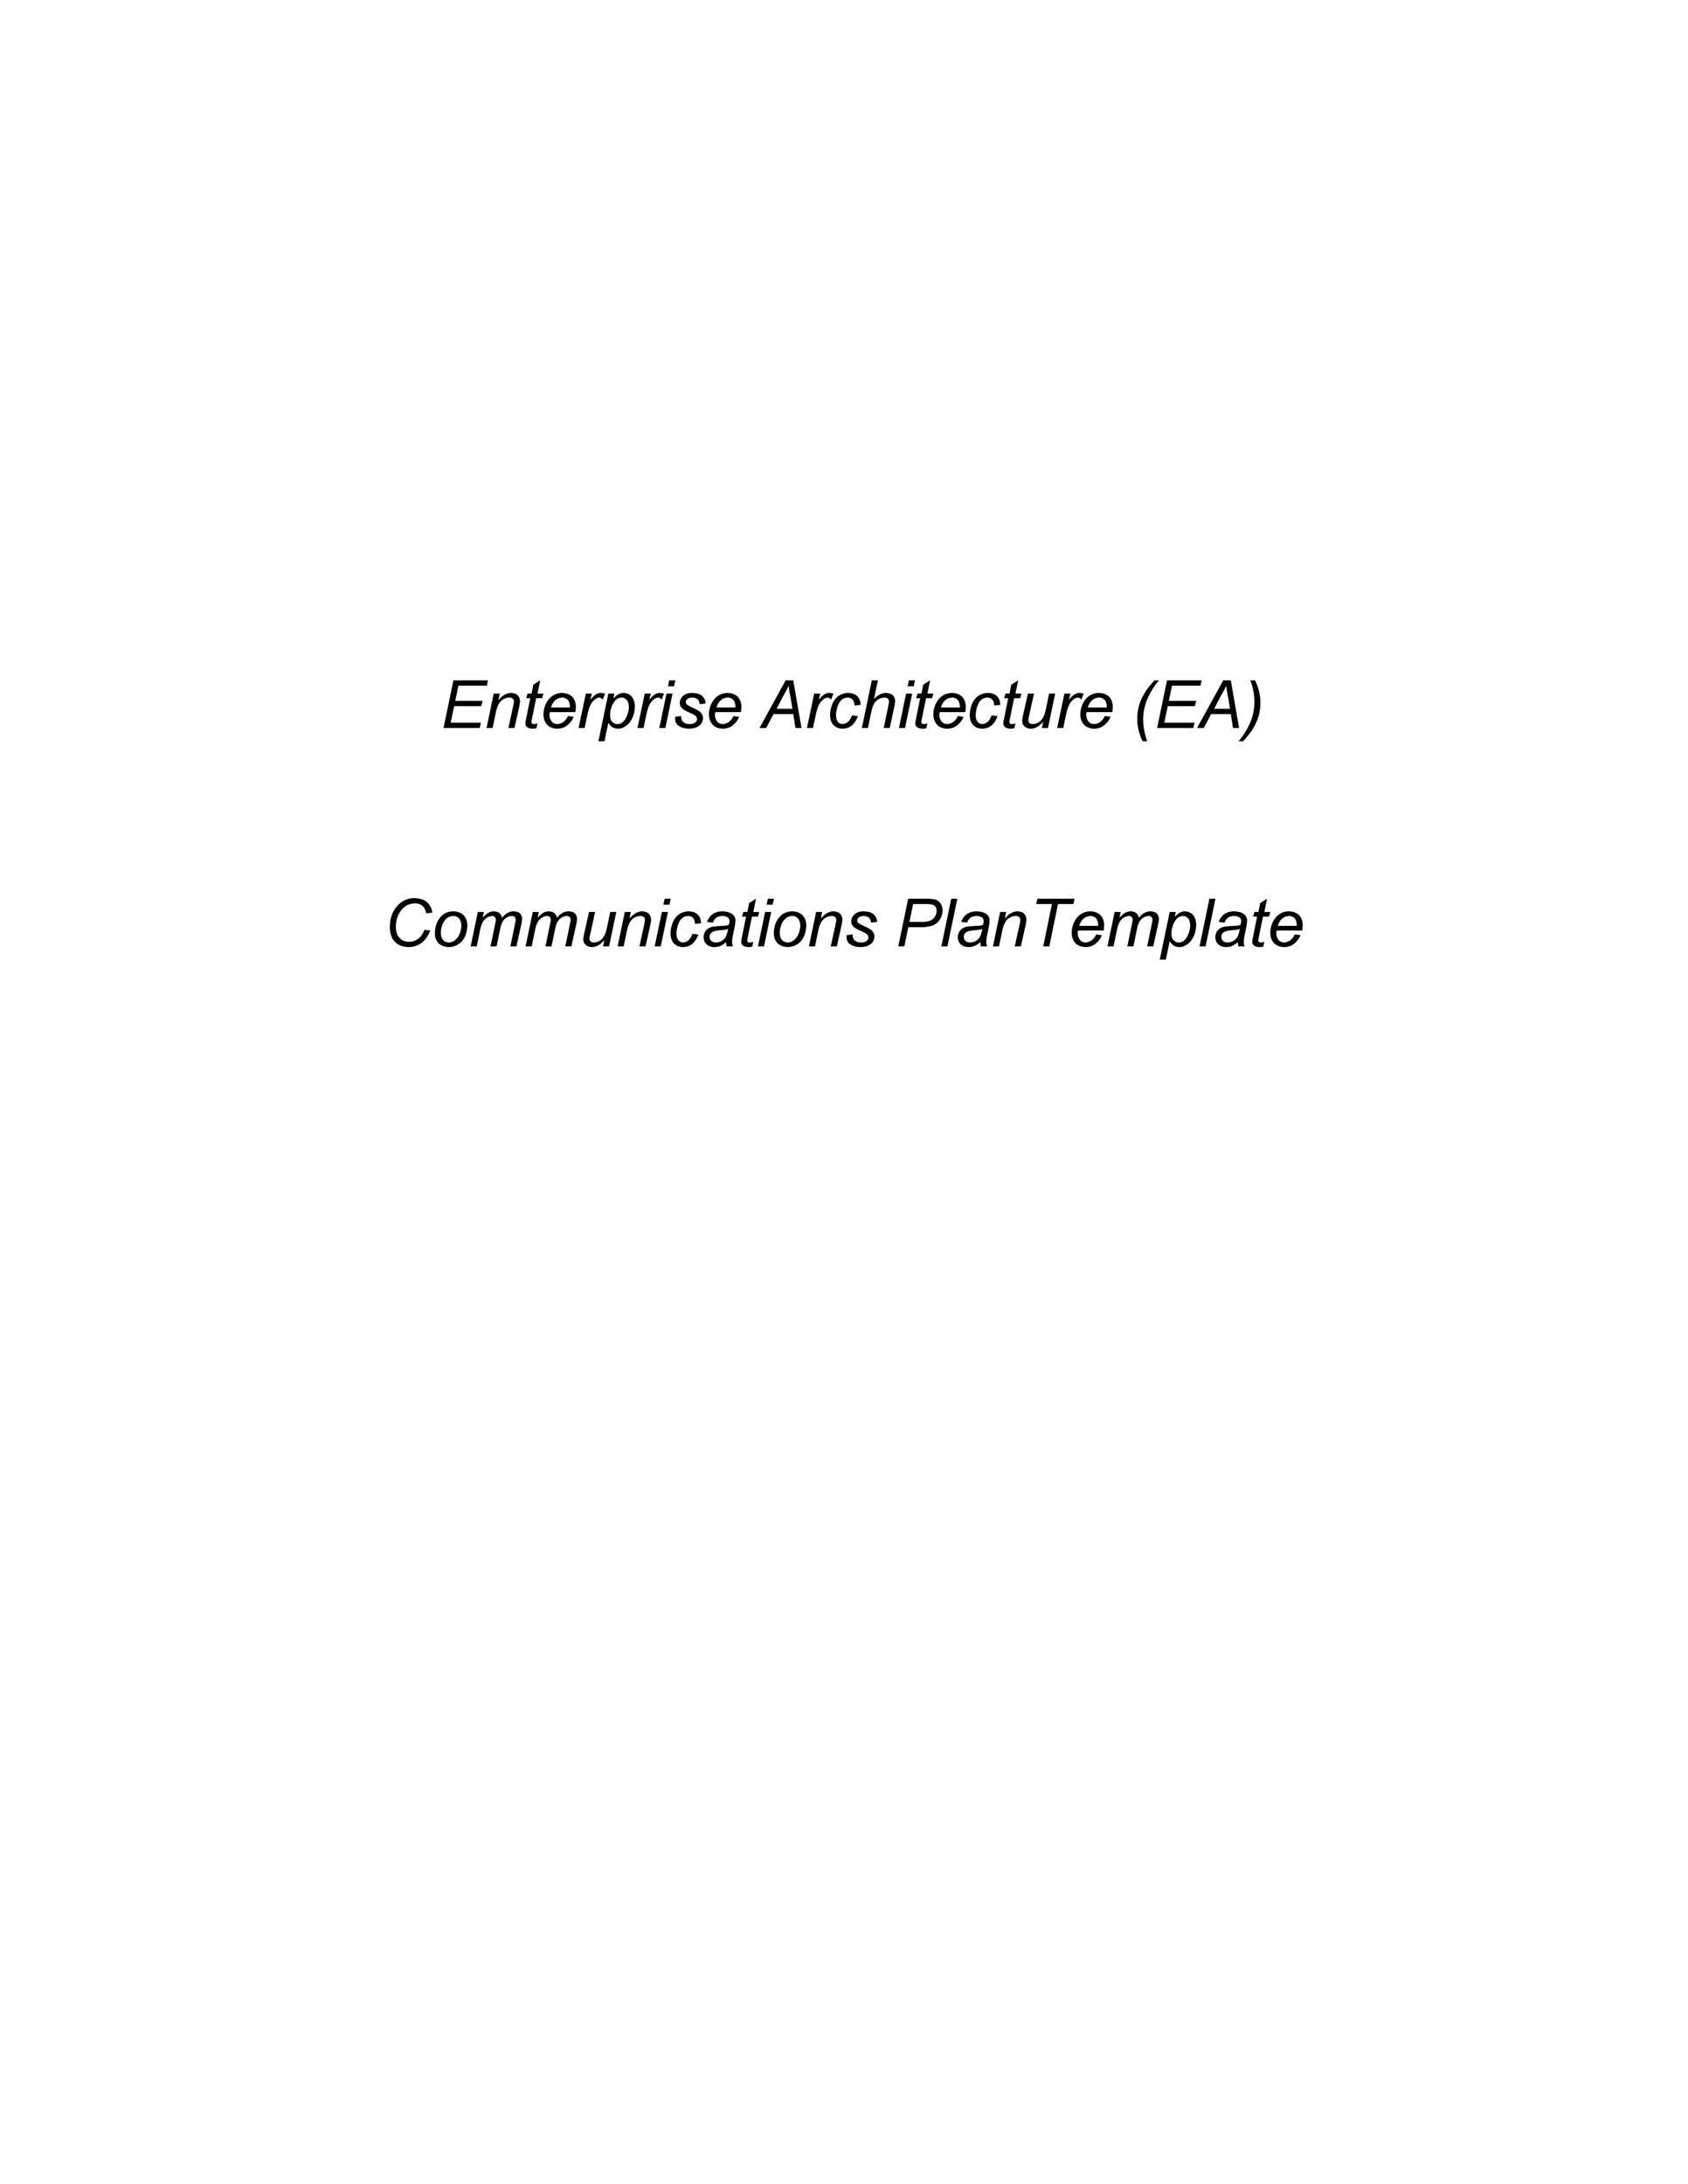 Free Communication Plan Template 18